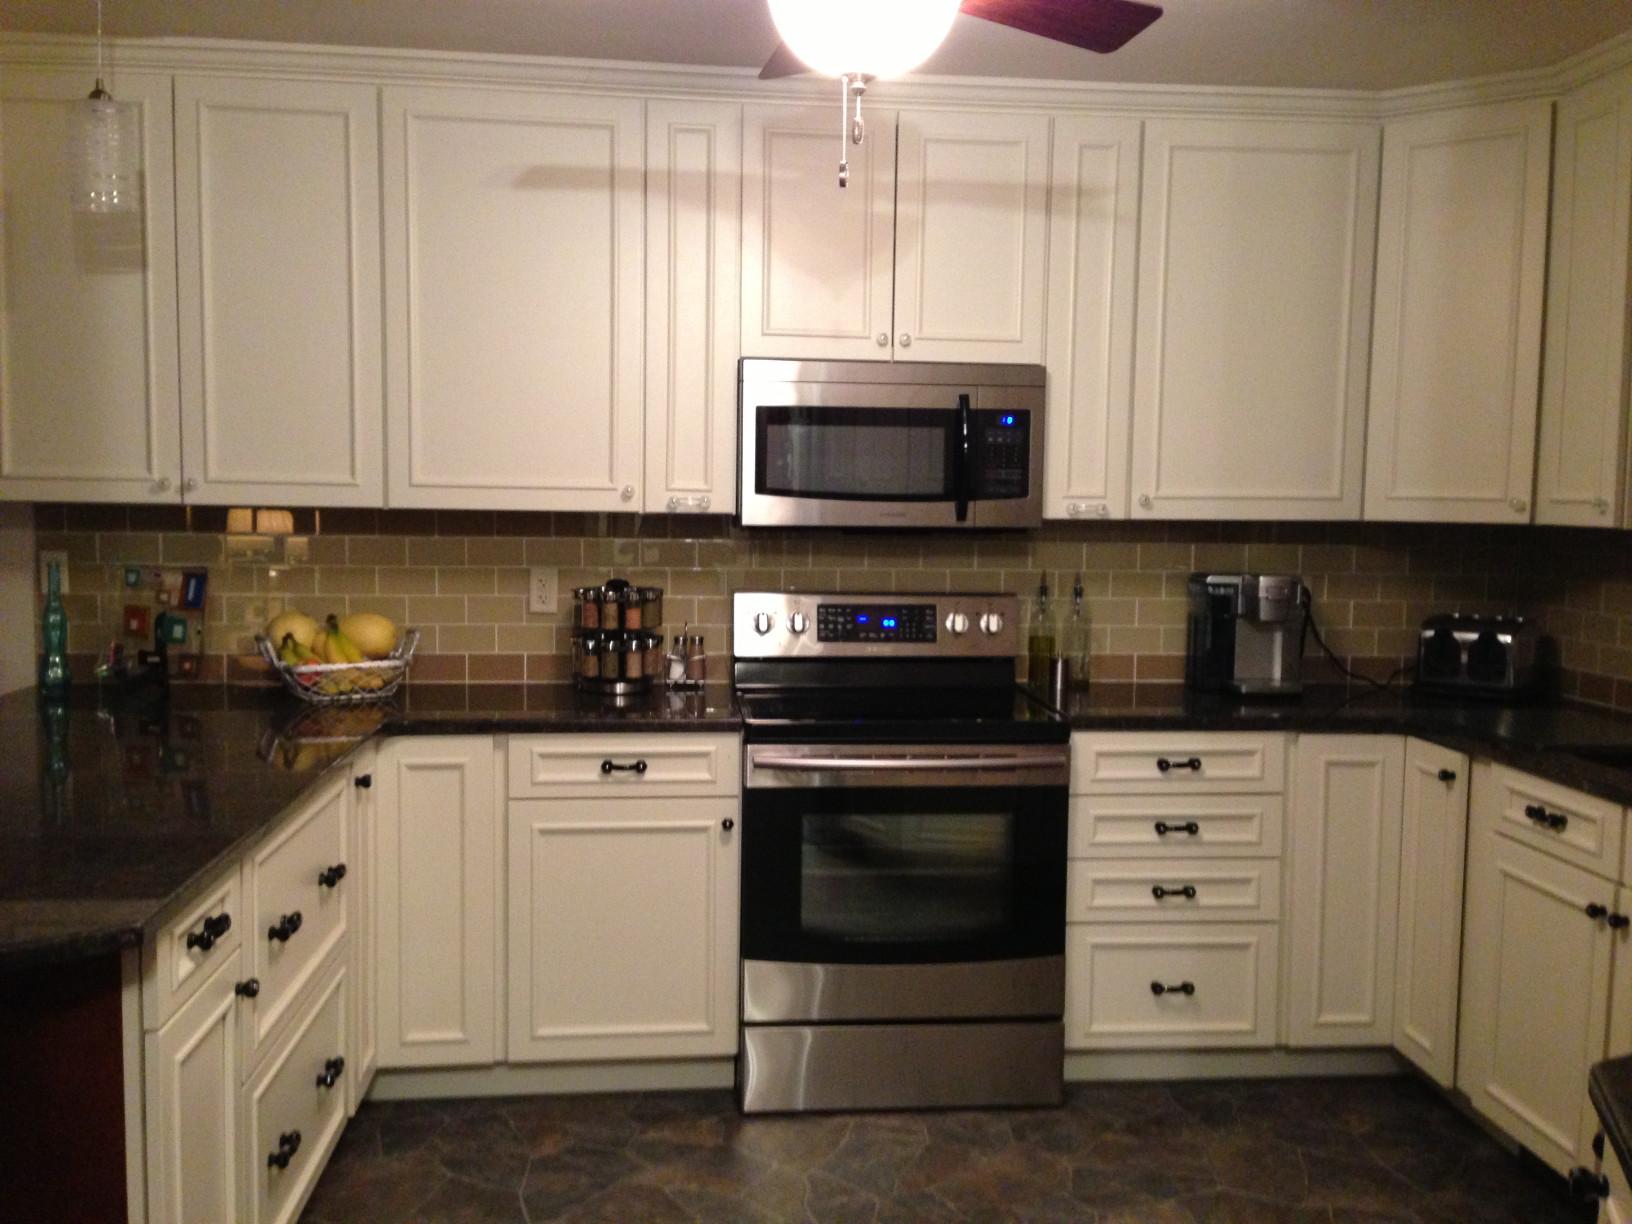 Kitchen Backsplash Subway Tile  Khaki Glass Subway Tile Subway Tile Outlet